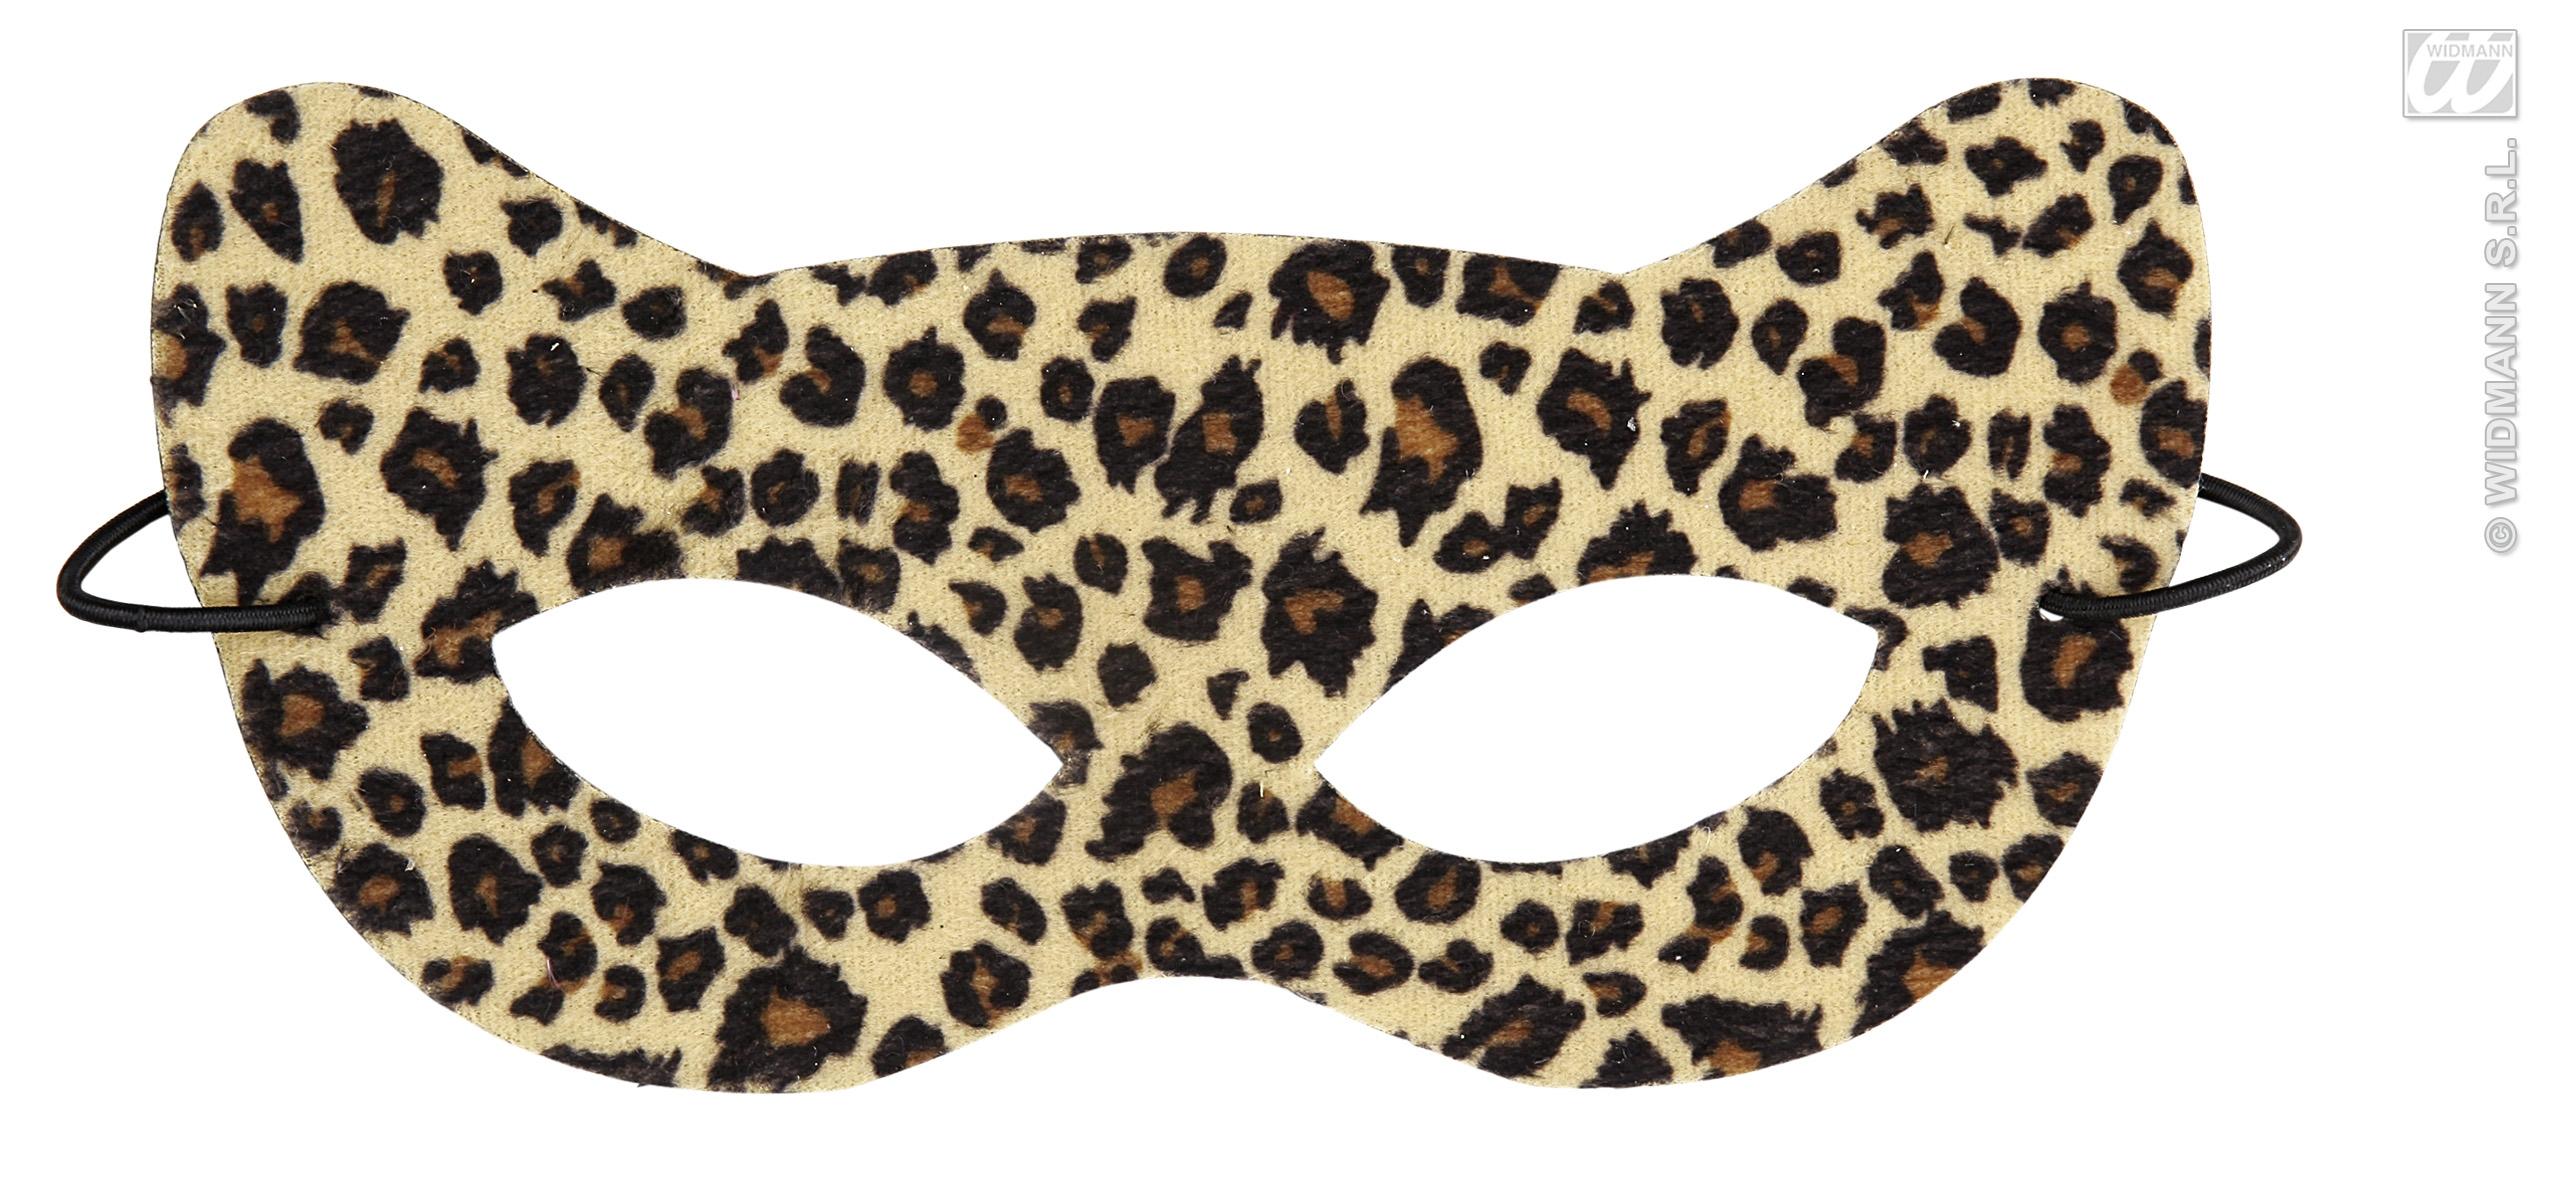 Masquerade clipart eye mask Mask Leopard Fancy Halloween Masquerade